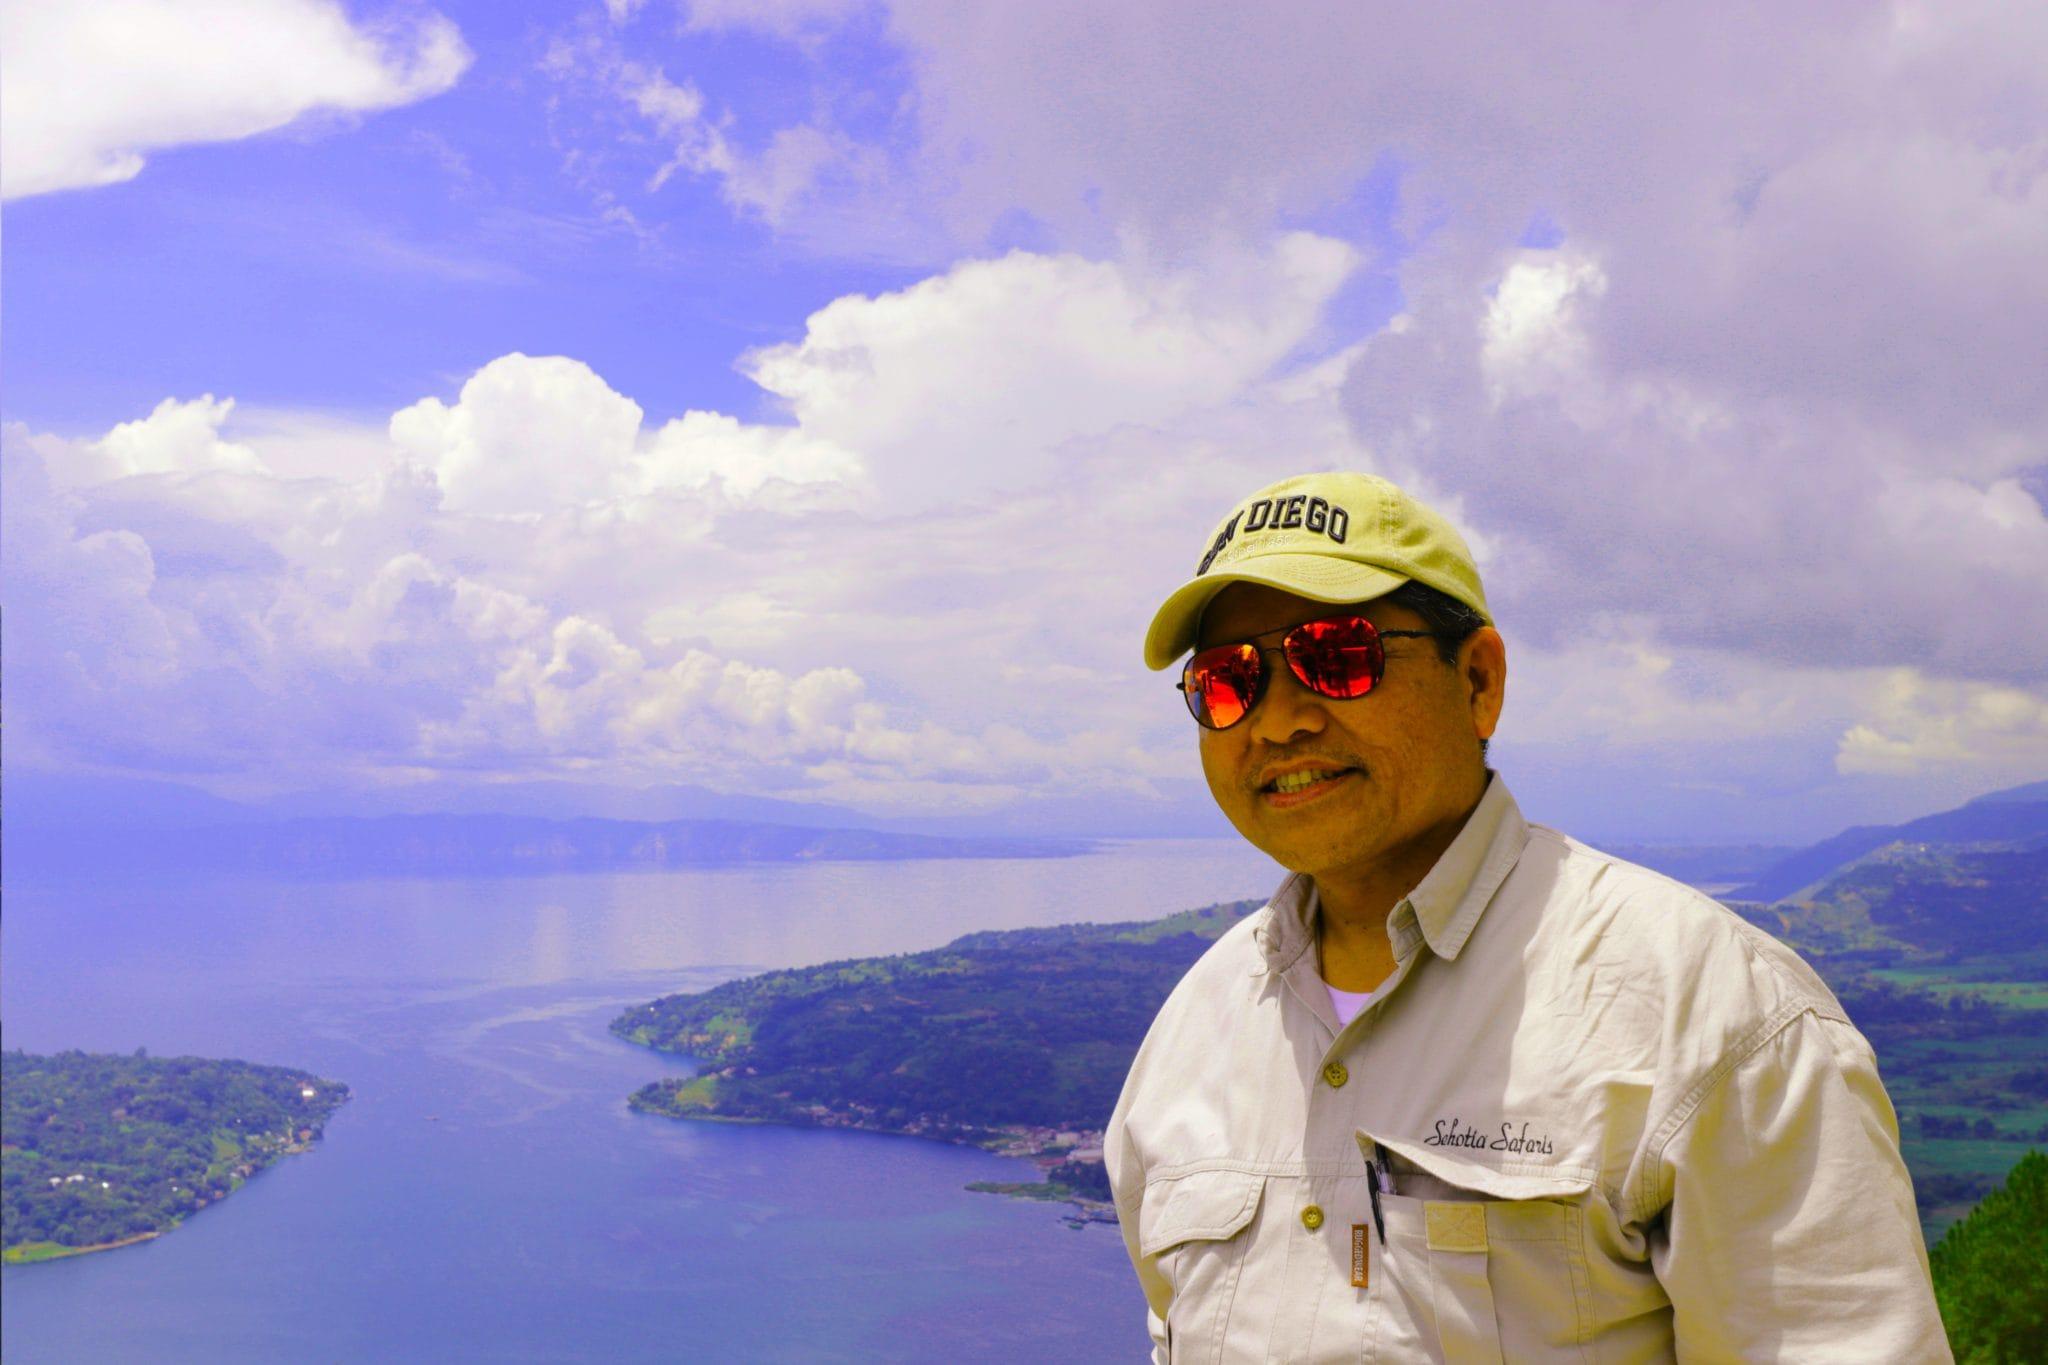 Deputi Safri Optimis Geopark Kaldera Toba Menjadi Unesco Global Geopark